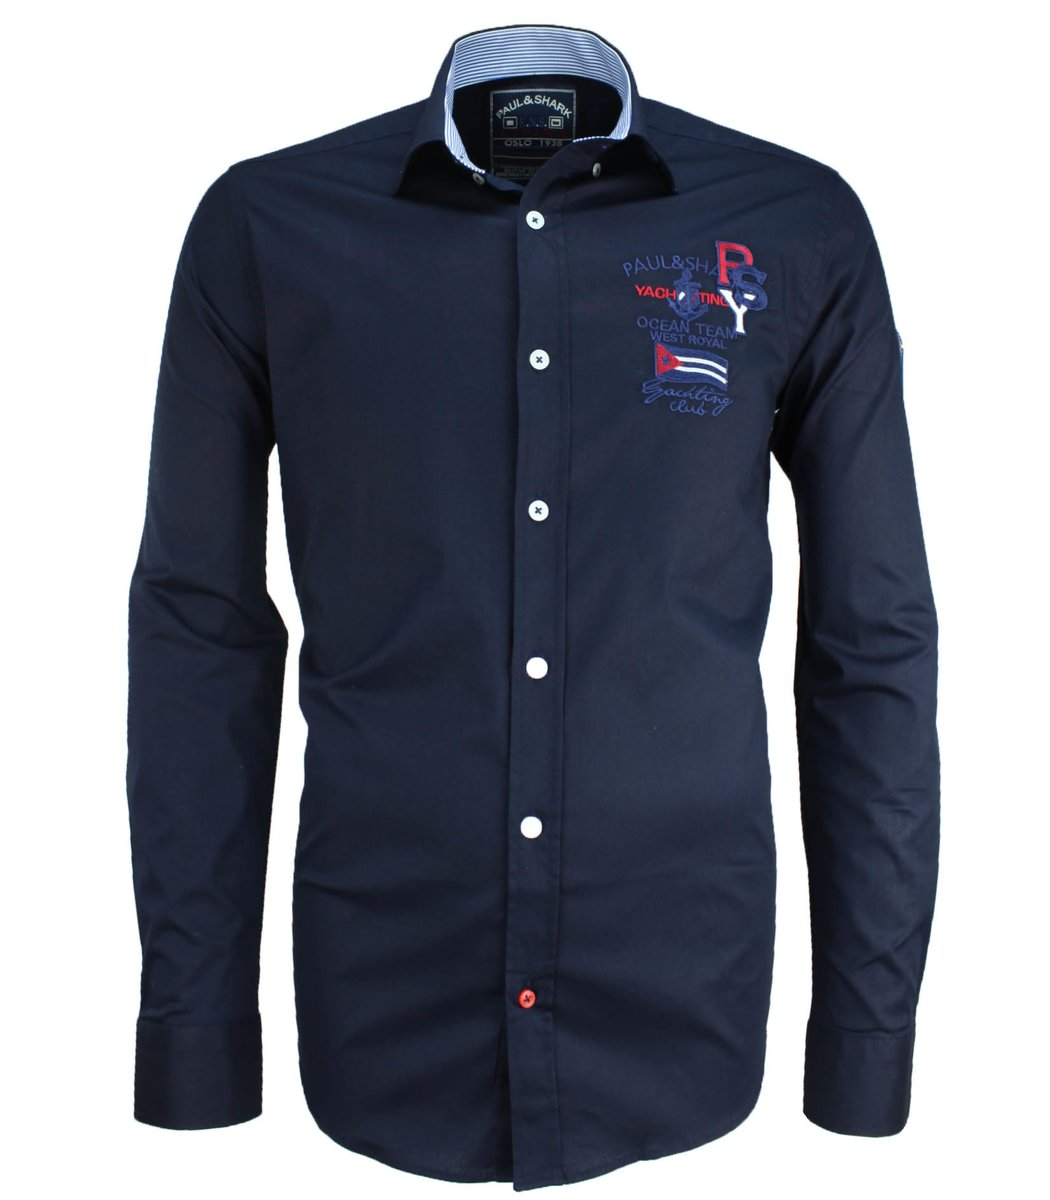 Темно-синяя рубашка Paul&Shark RP3 (2895)